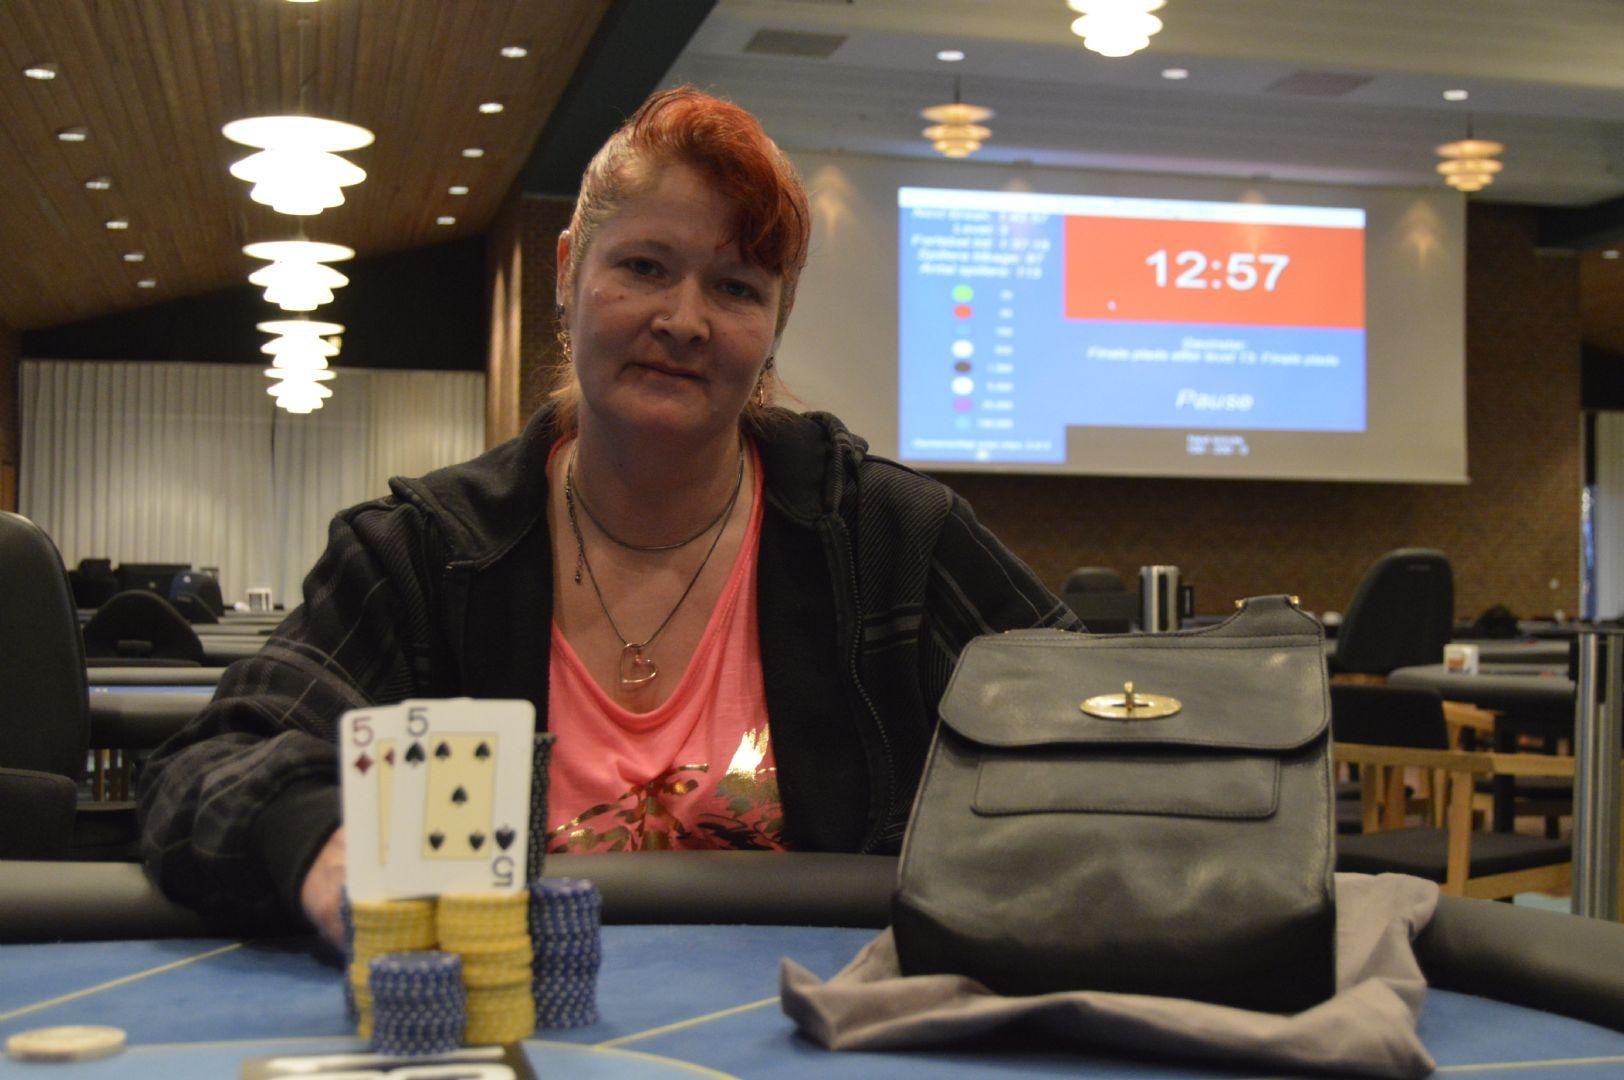 Junie, Taske, Casino Munkebjerg, Pokernyheder, Live Poker